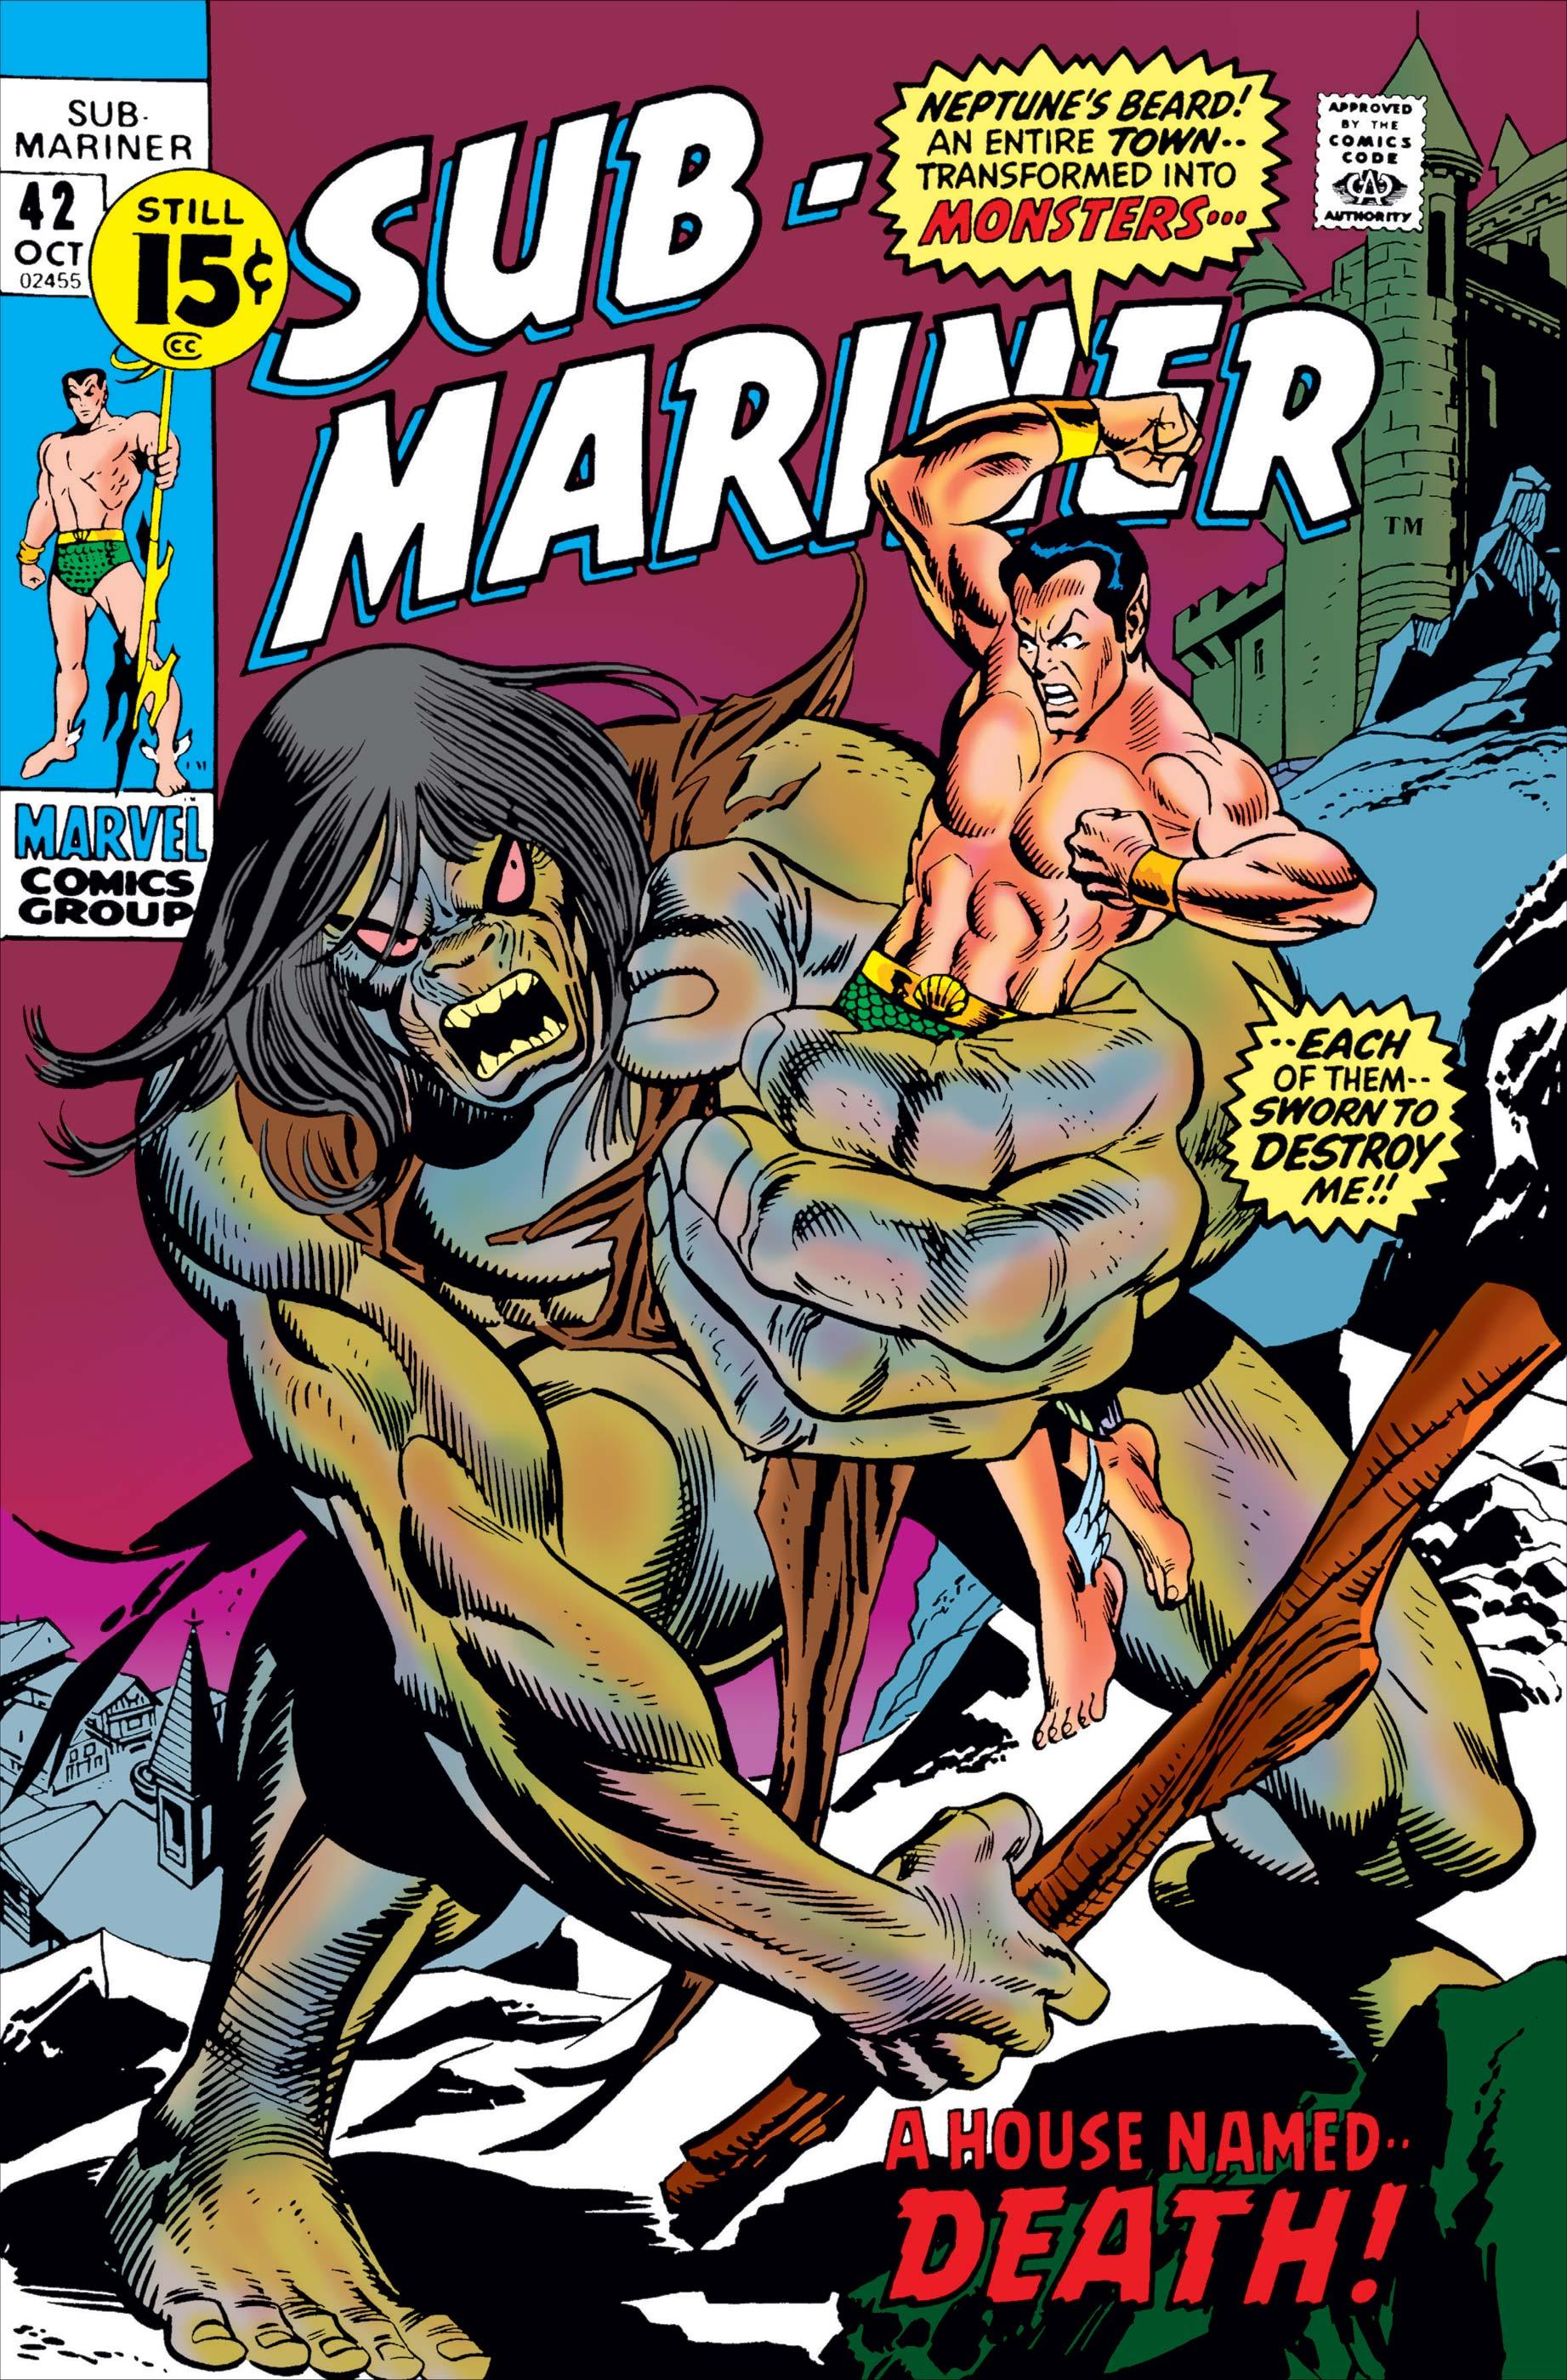 Sub-Mariner (1968) #42